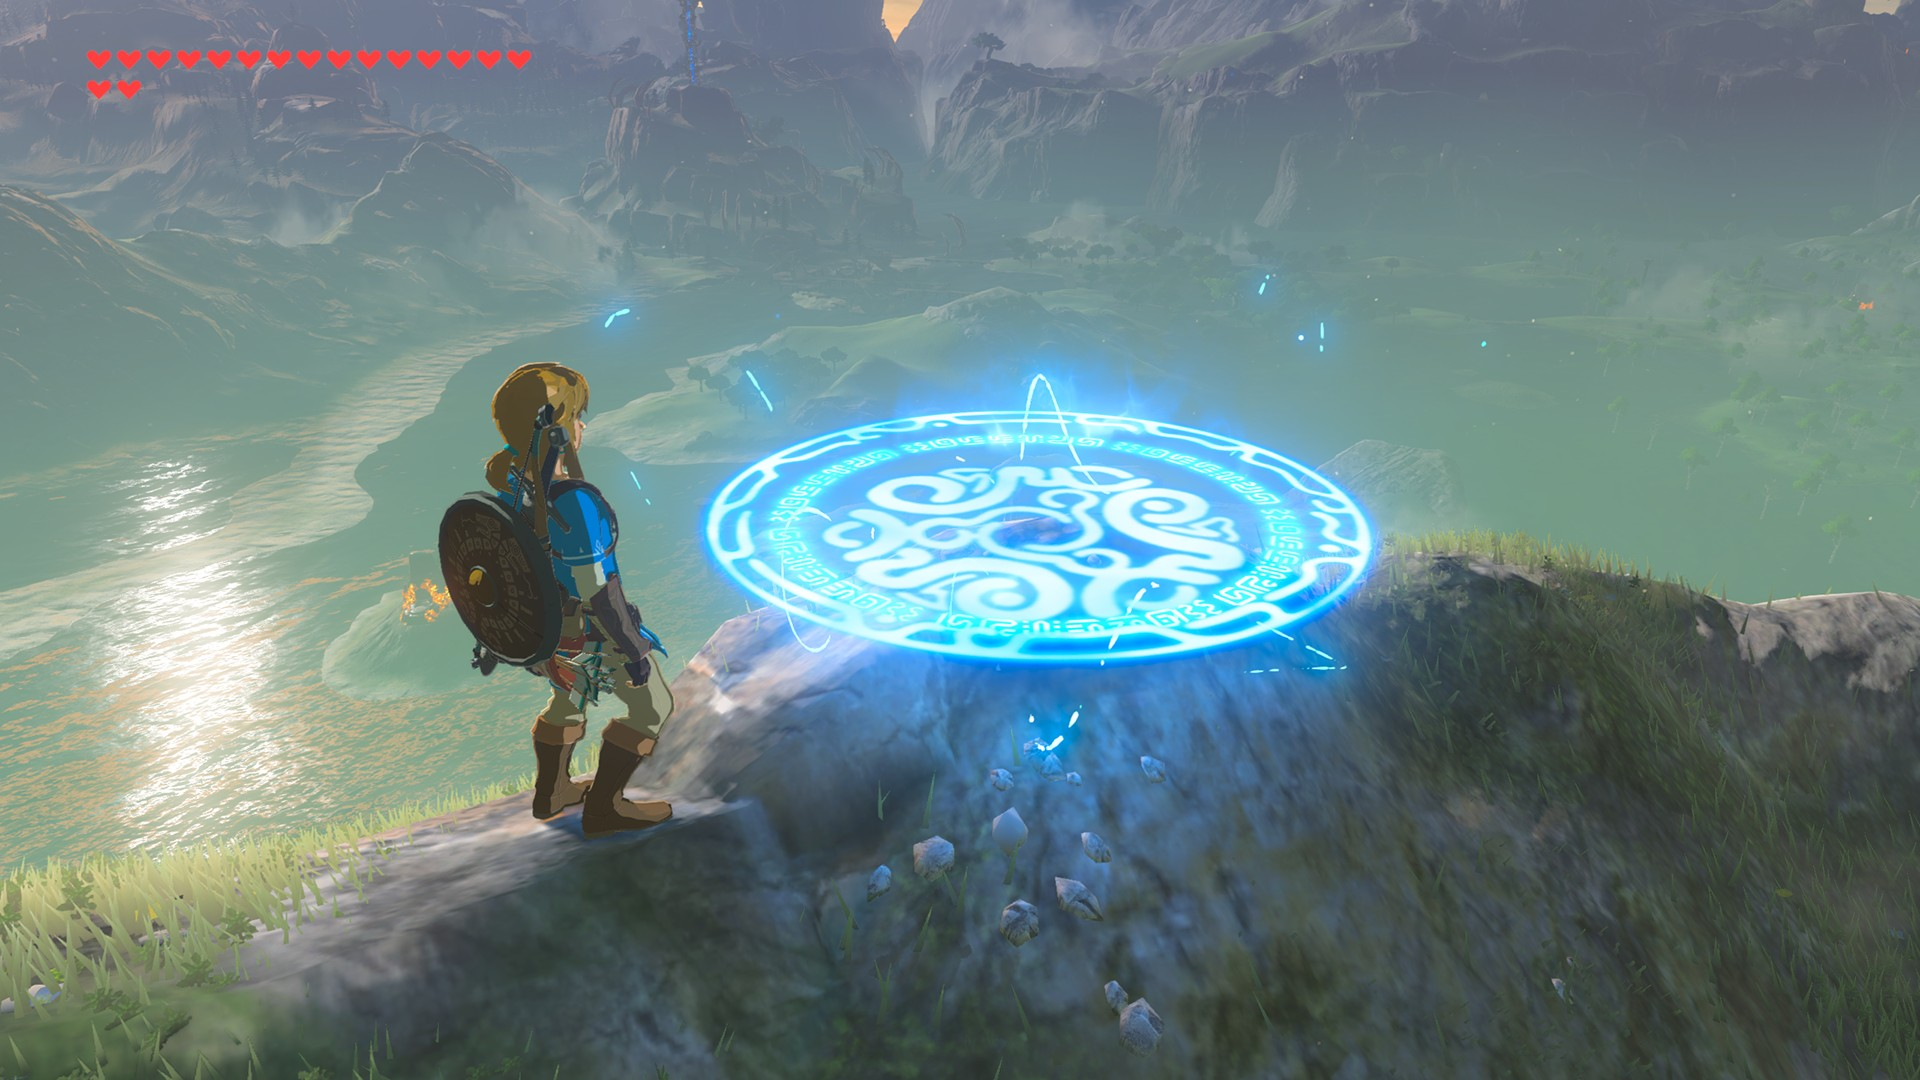 Best Anime Wallpaper Engine The Legend Of Zelda Breath Of The Wild Guide Armor Set